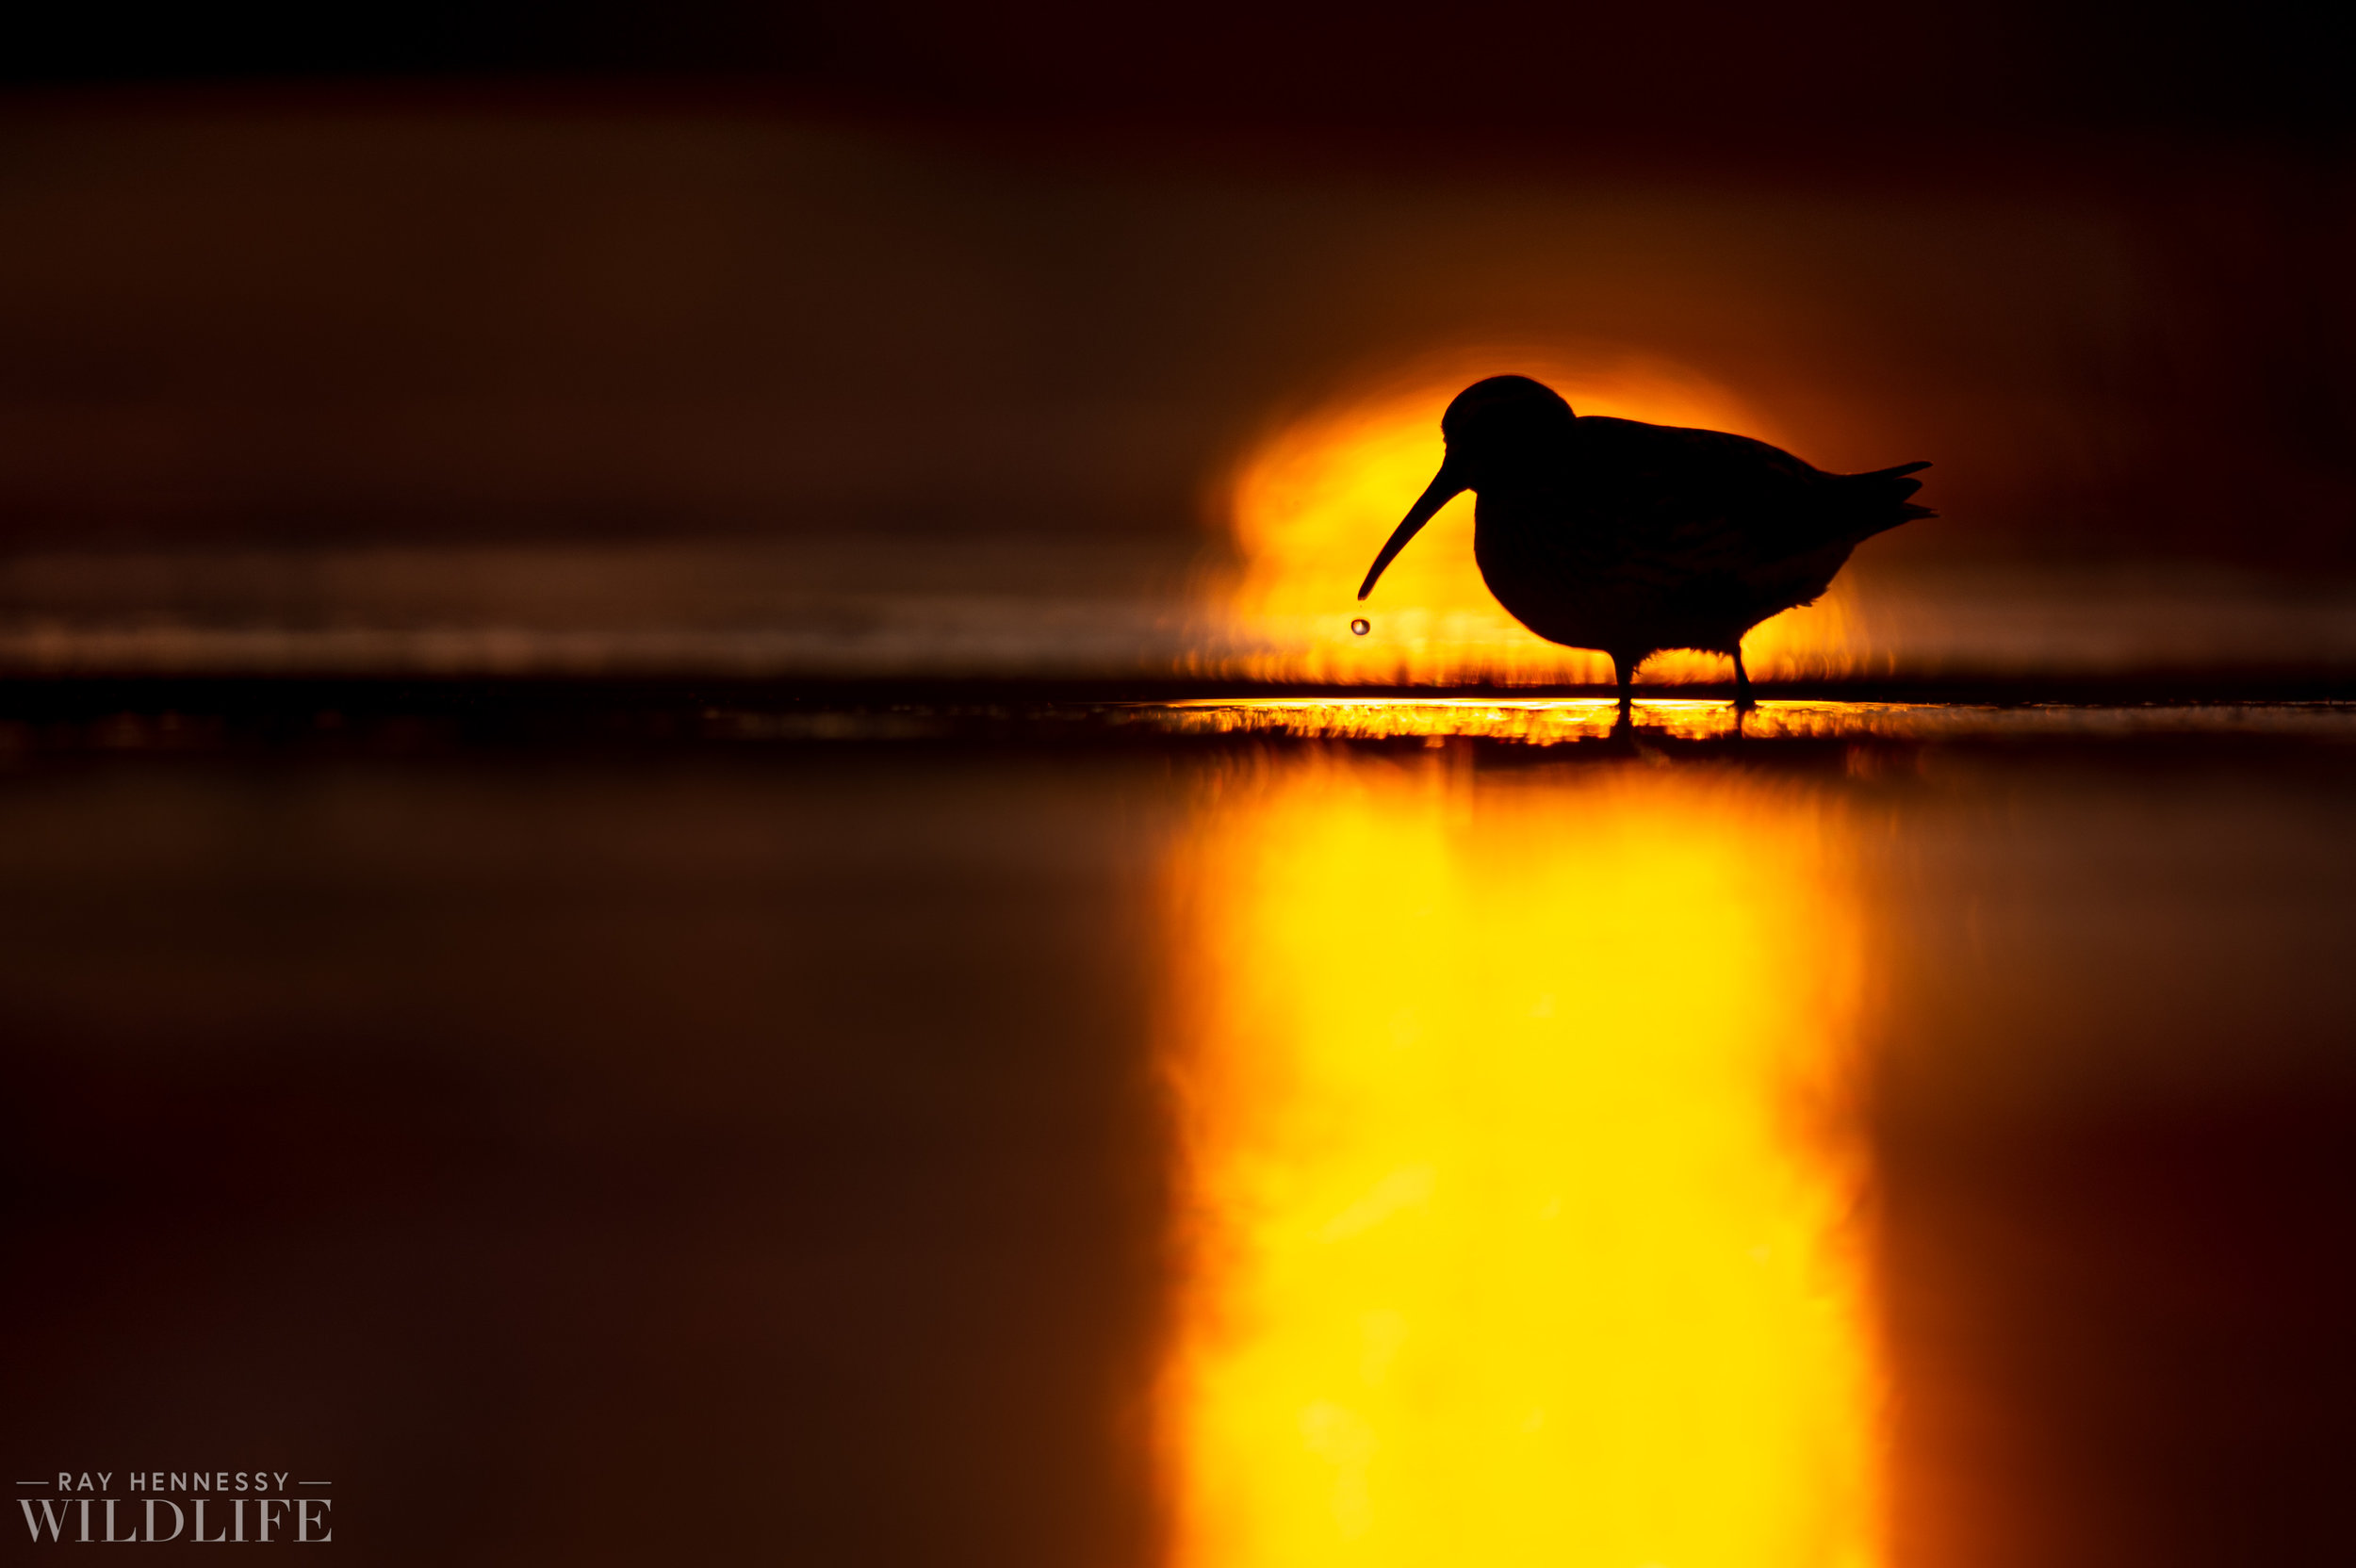 001_shorebirds-prothonotary-warbler.jpg